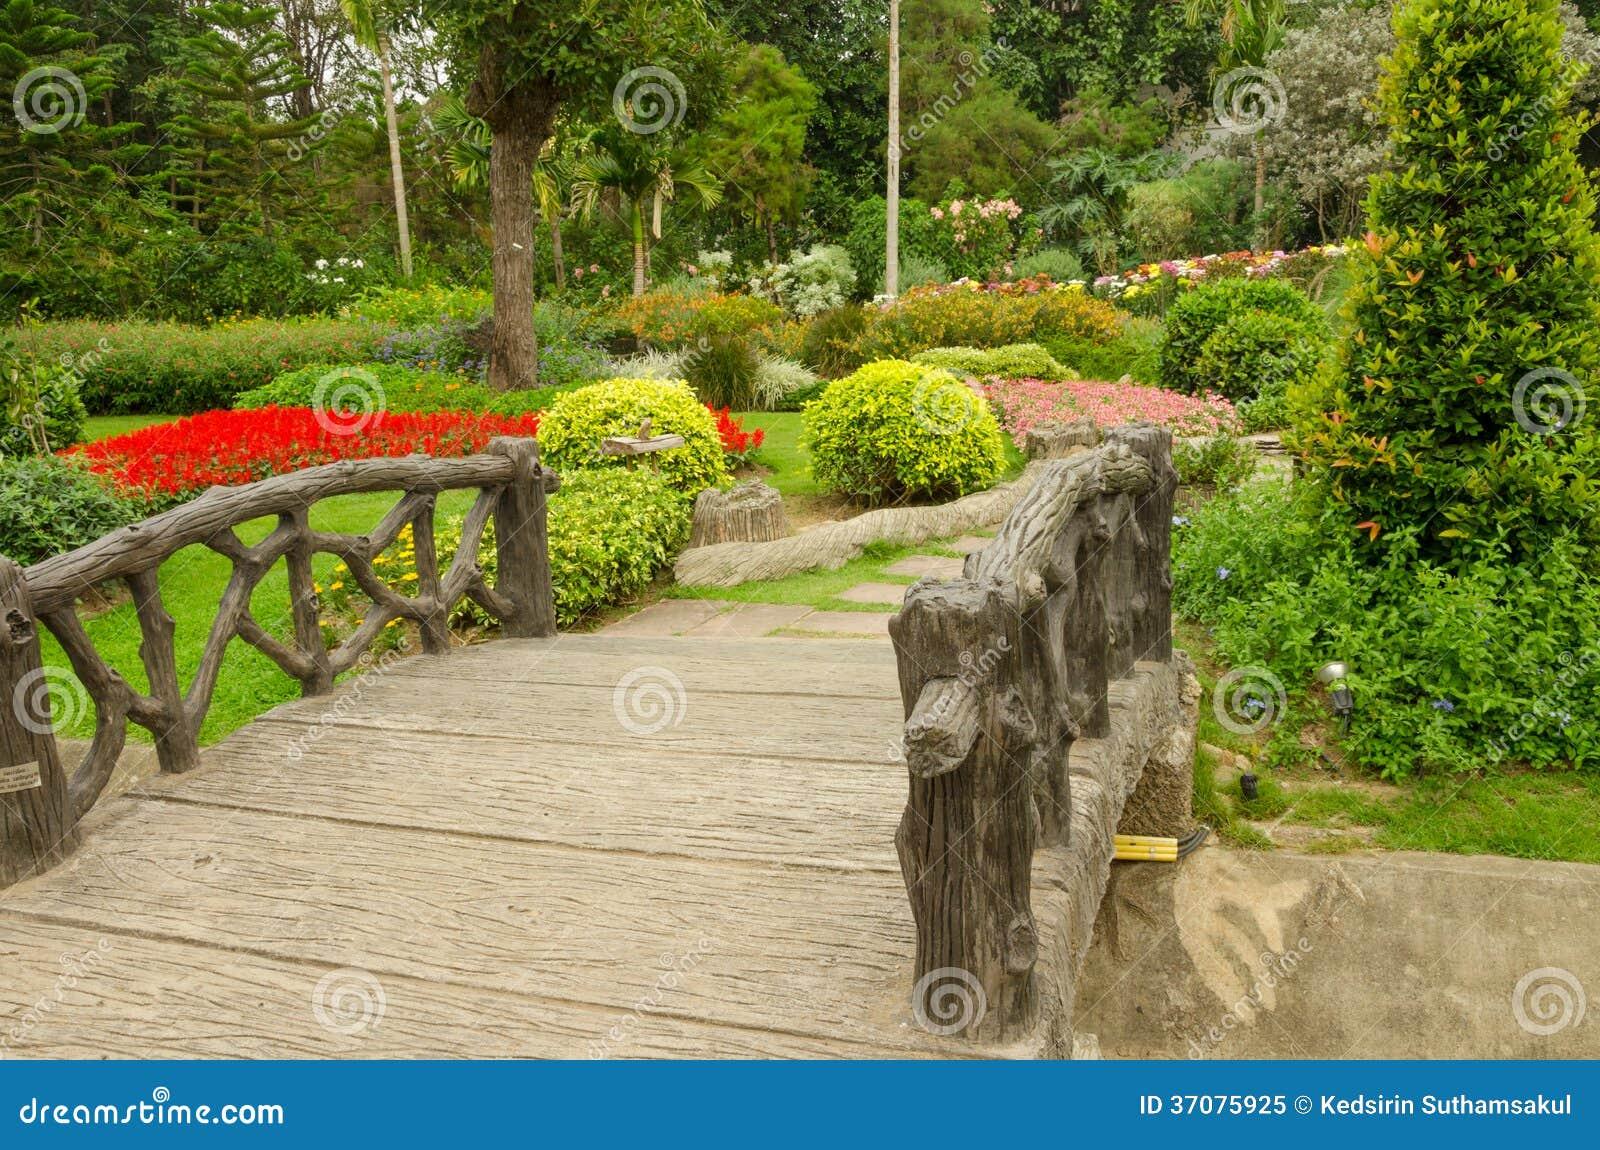 Park Als Tuin : Kleurrijke bloembedden in mooi park in tuin thailand stock